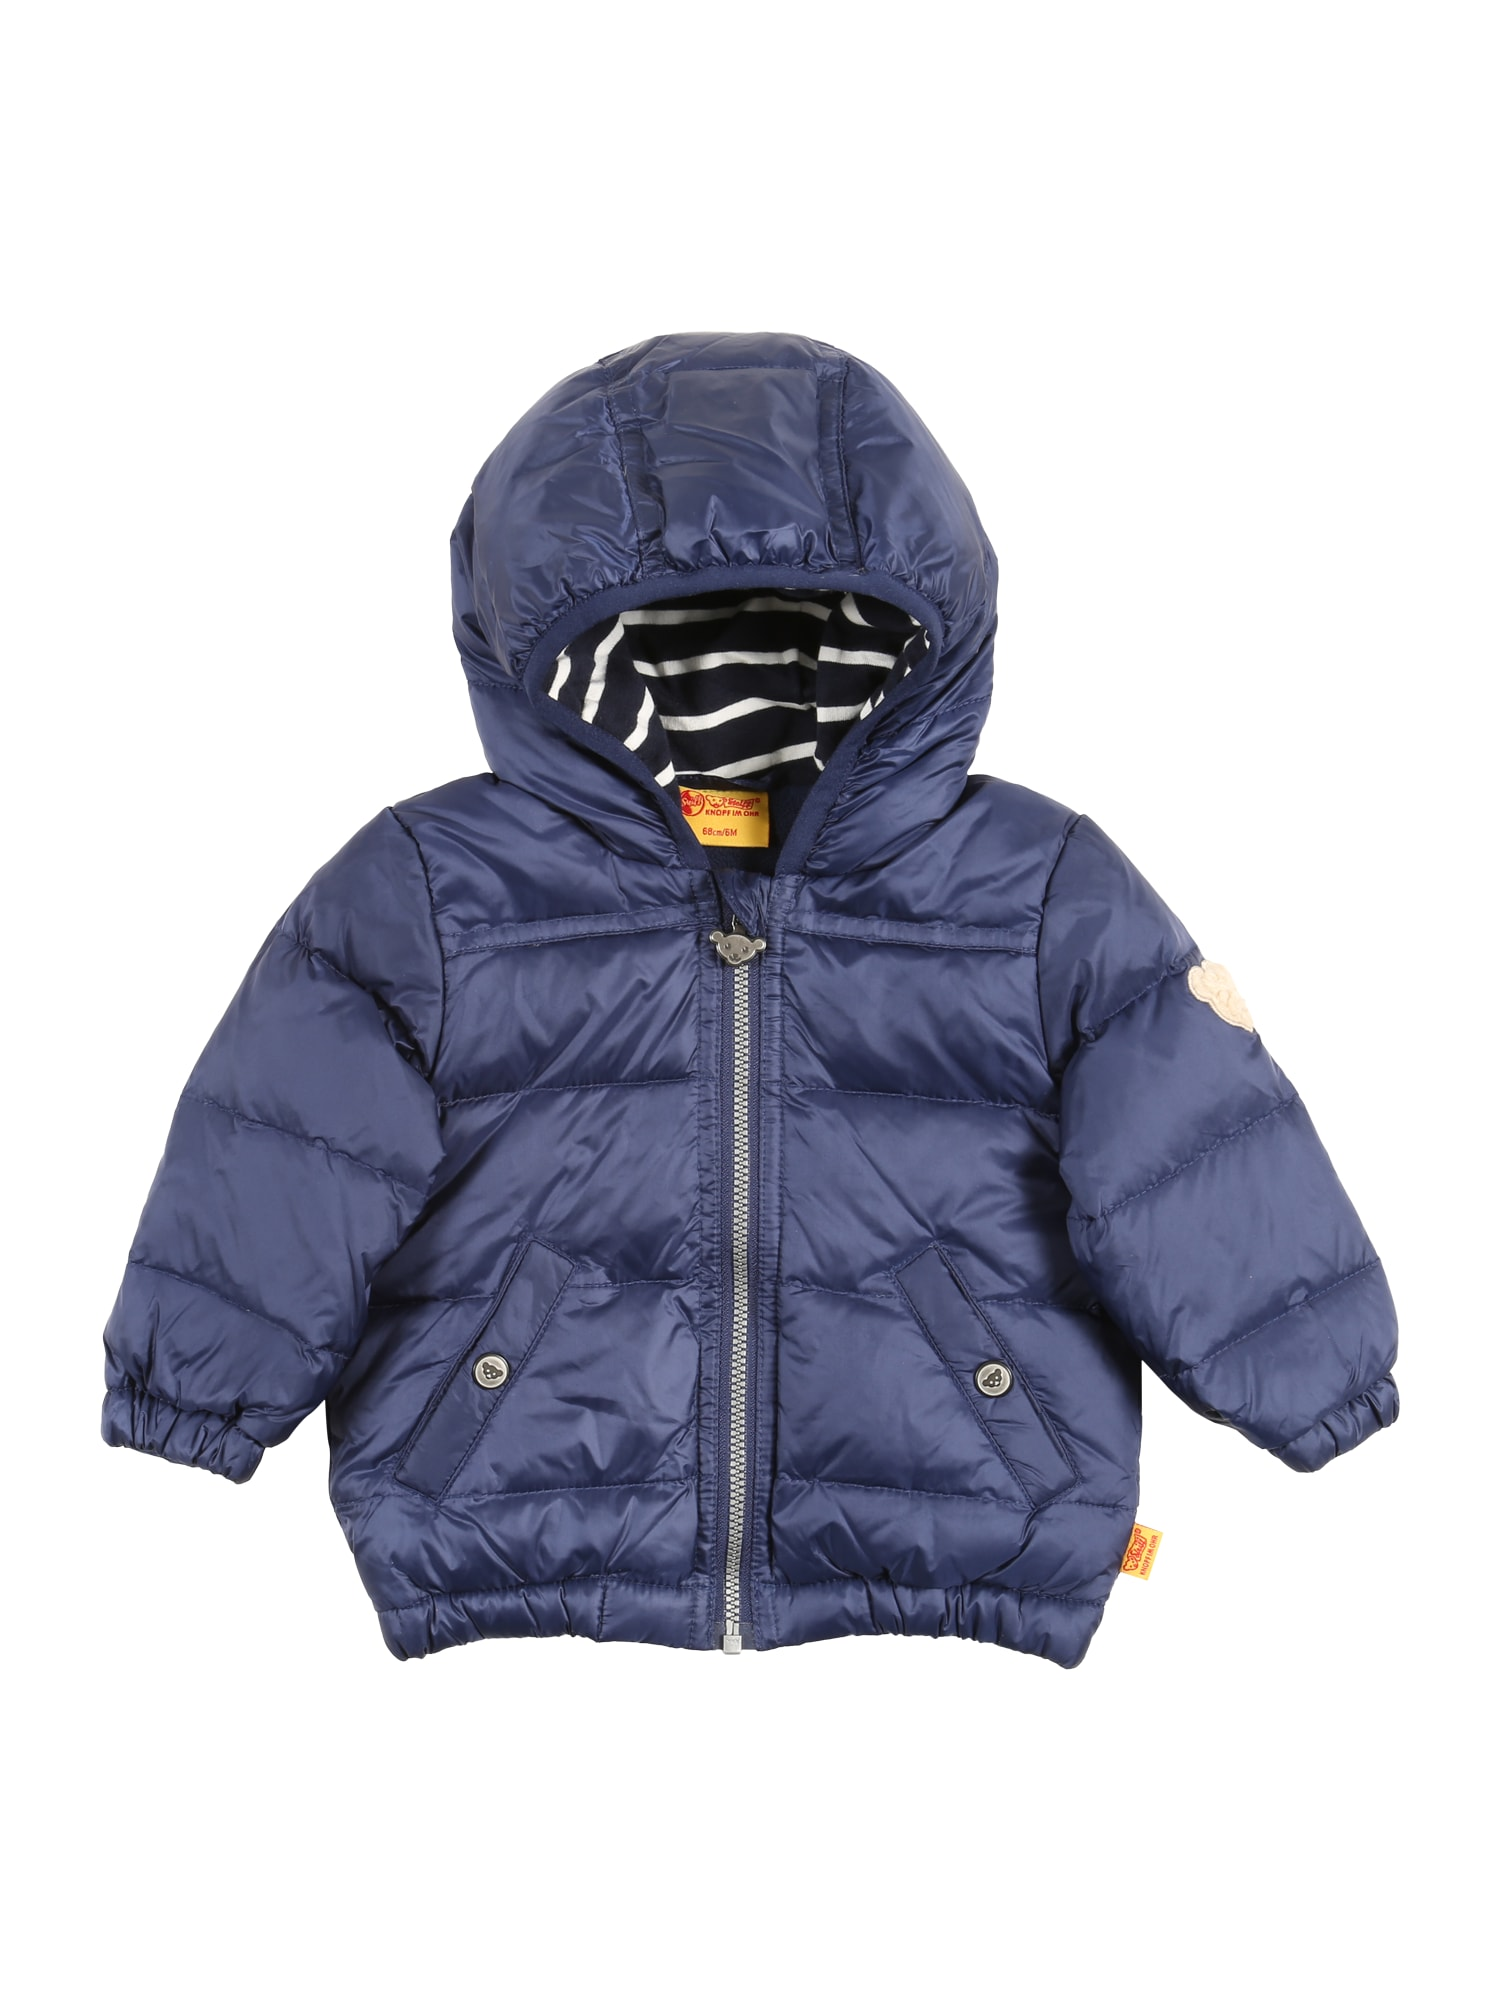 Přechodná bunda tmavě modrá bílá Steiff Collection